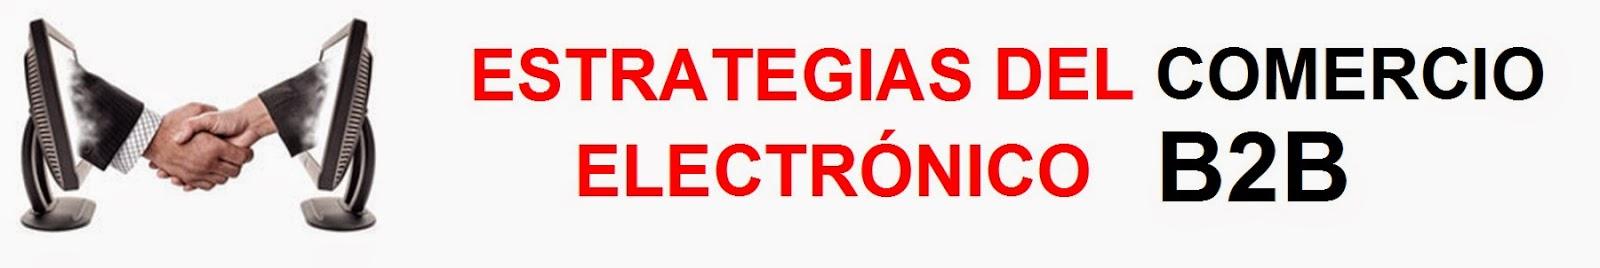 comercio-electronico-b2b